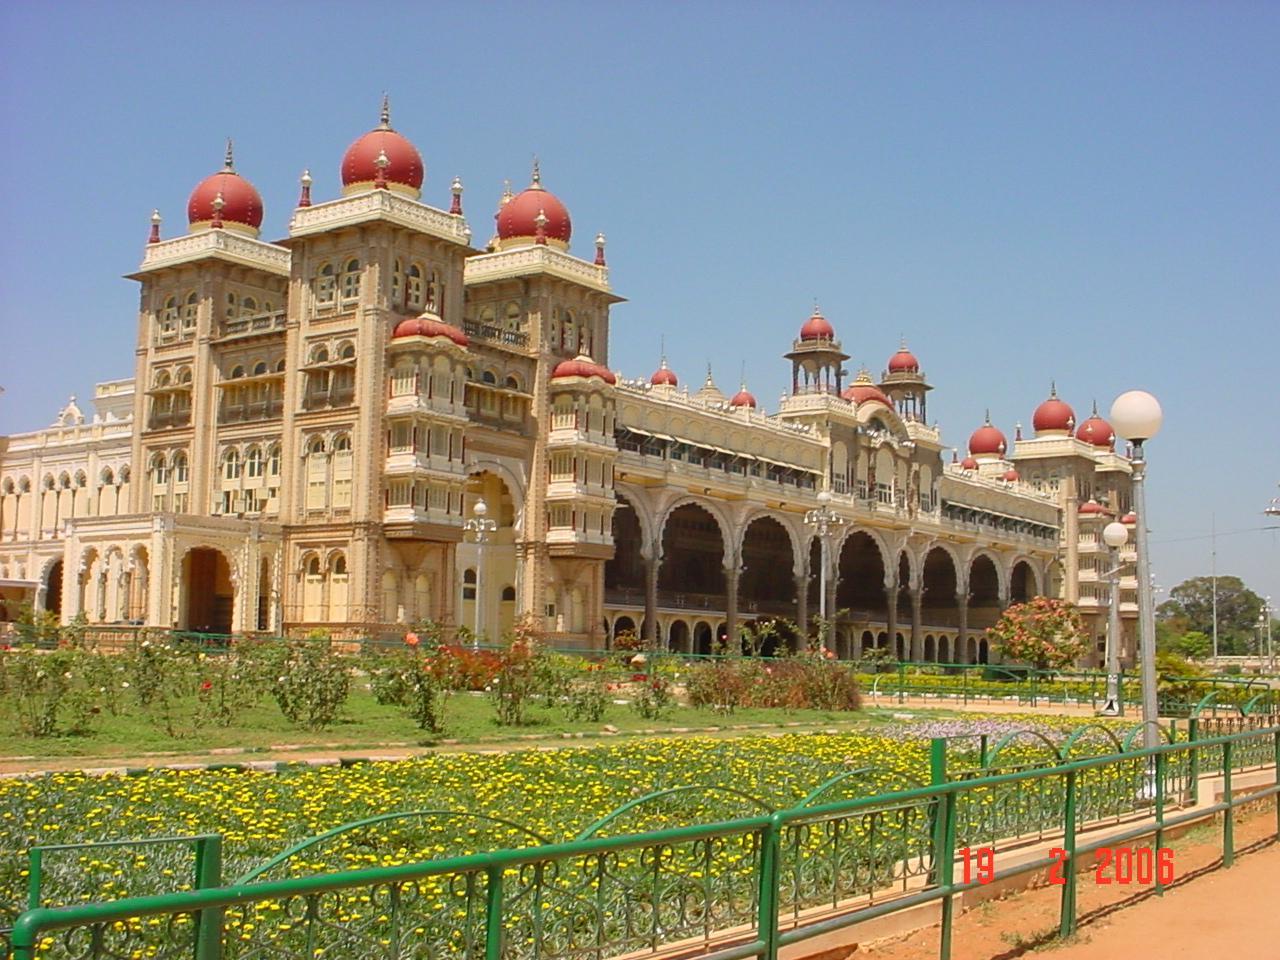 http://www.prasannaholidays.com/wp-content/uploads/2015/10/Classic_Karnataka_02.jpg